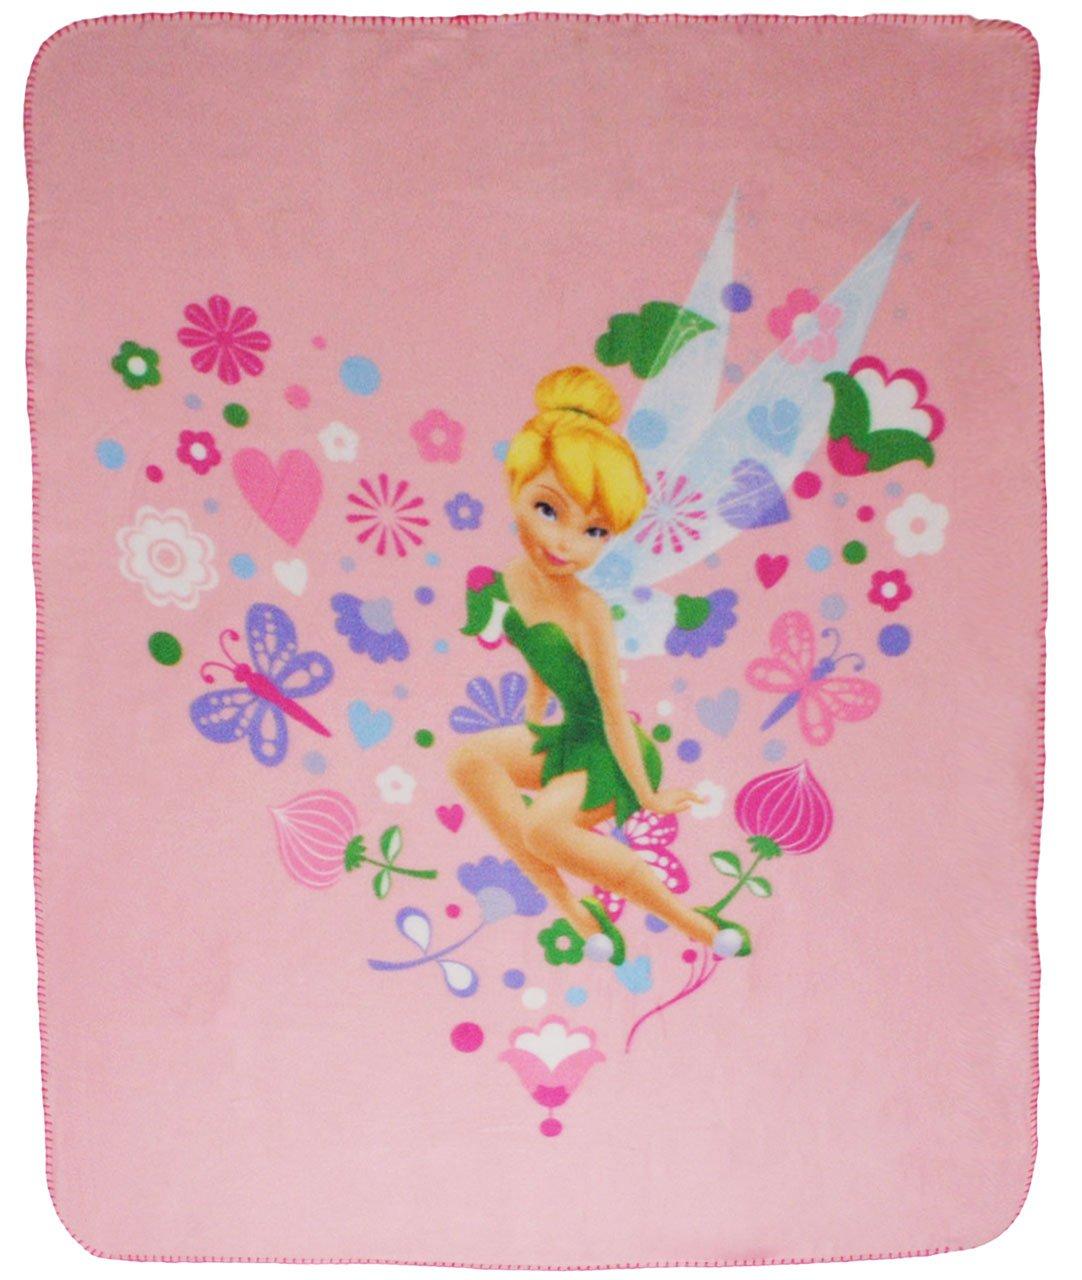 alles-meine.de GmbH Kuscheldecke / Fleecedecke - Disney Fairies - Tinkerbell - Incl. Name - 11..